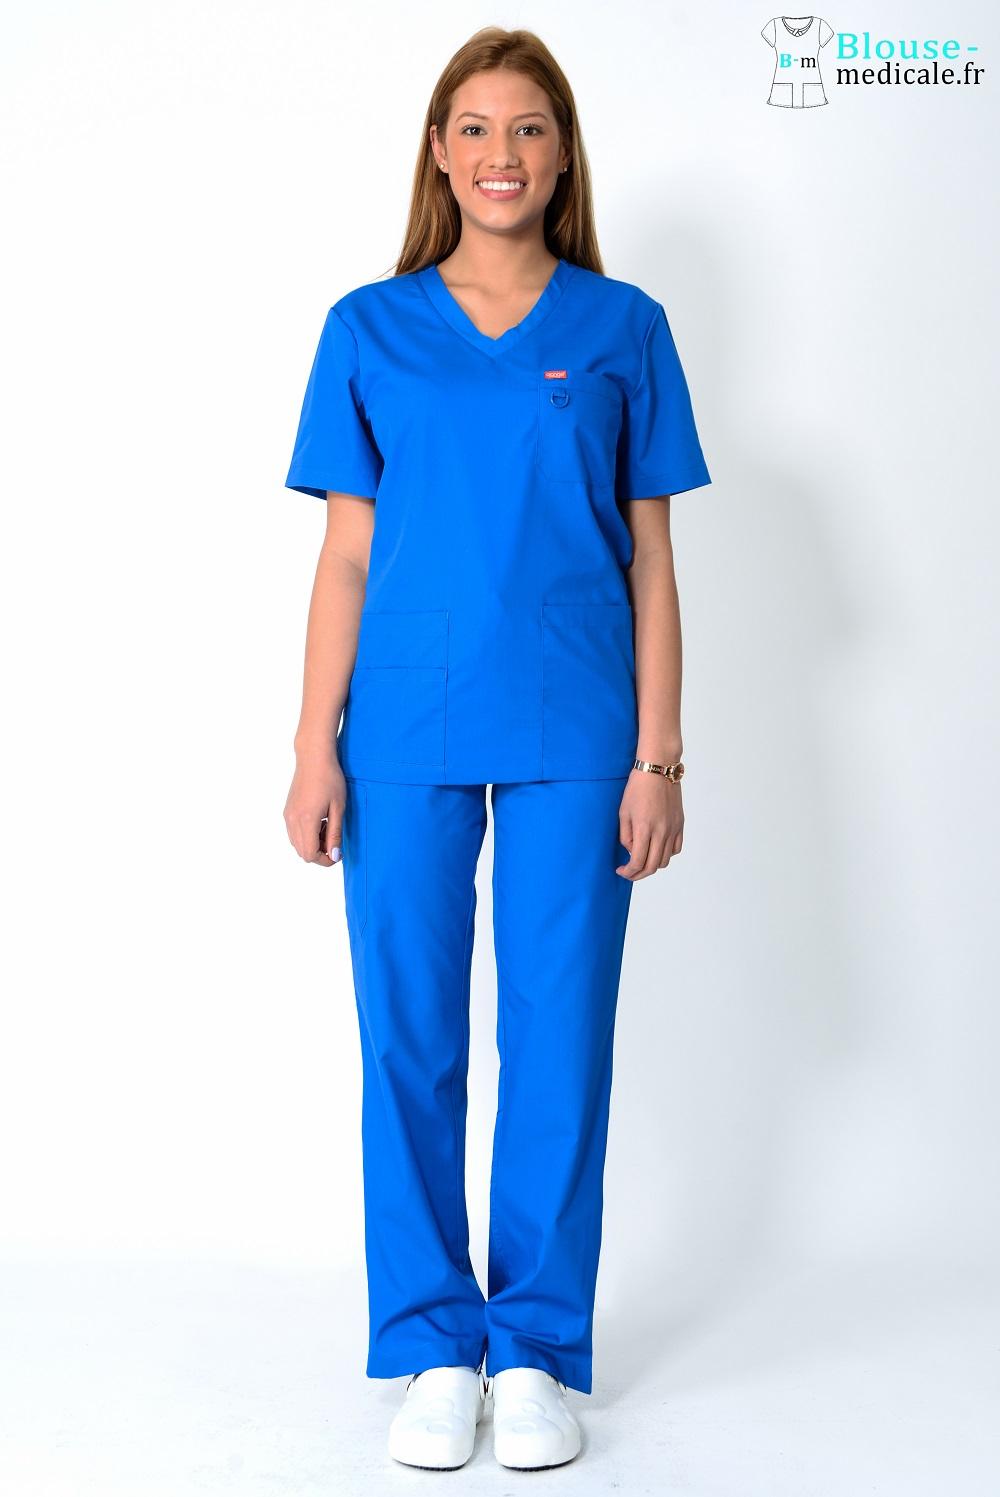 tenue médicale unisexe tenue equipe medicale couleur femme